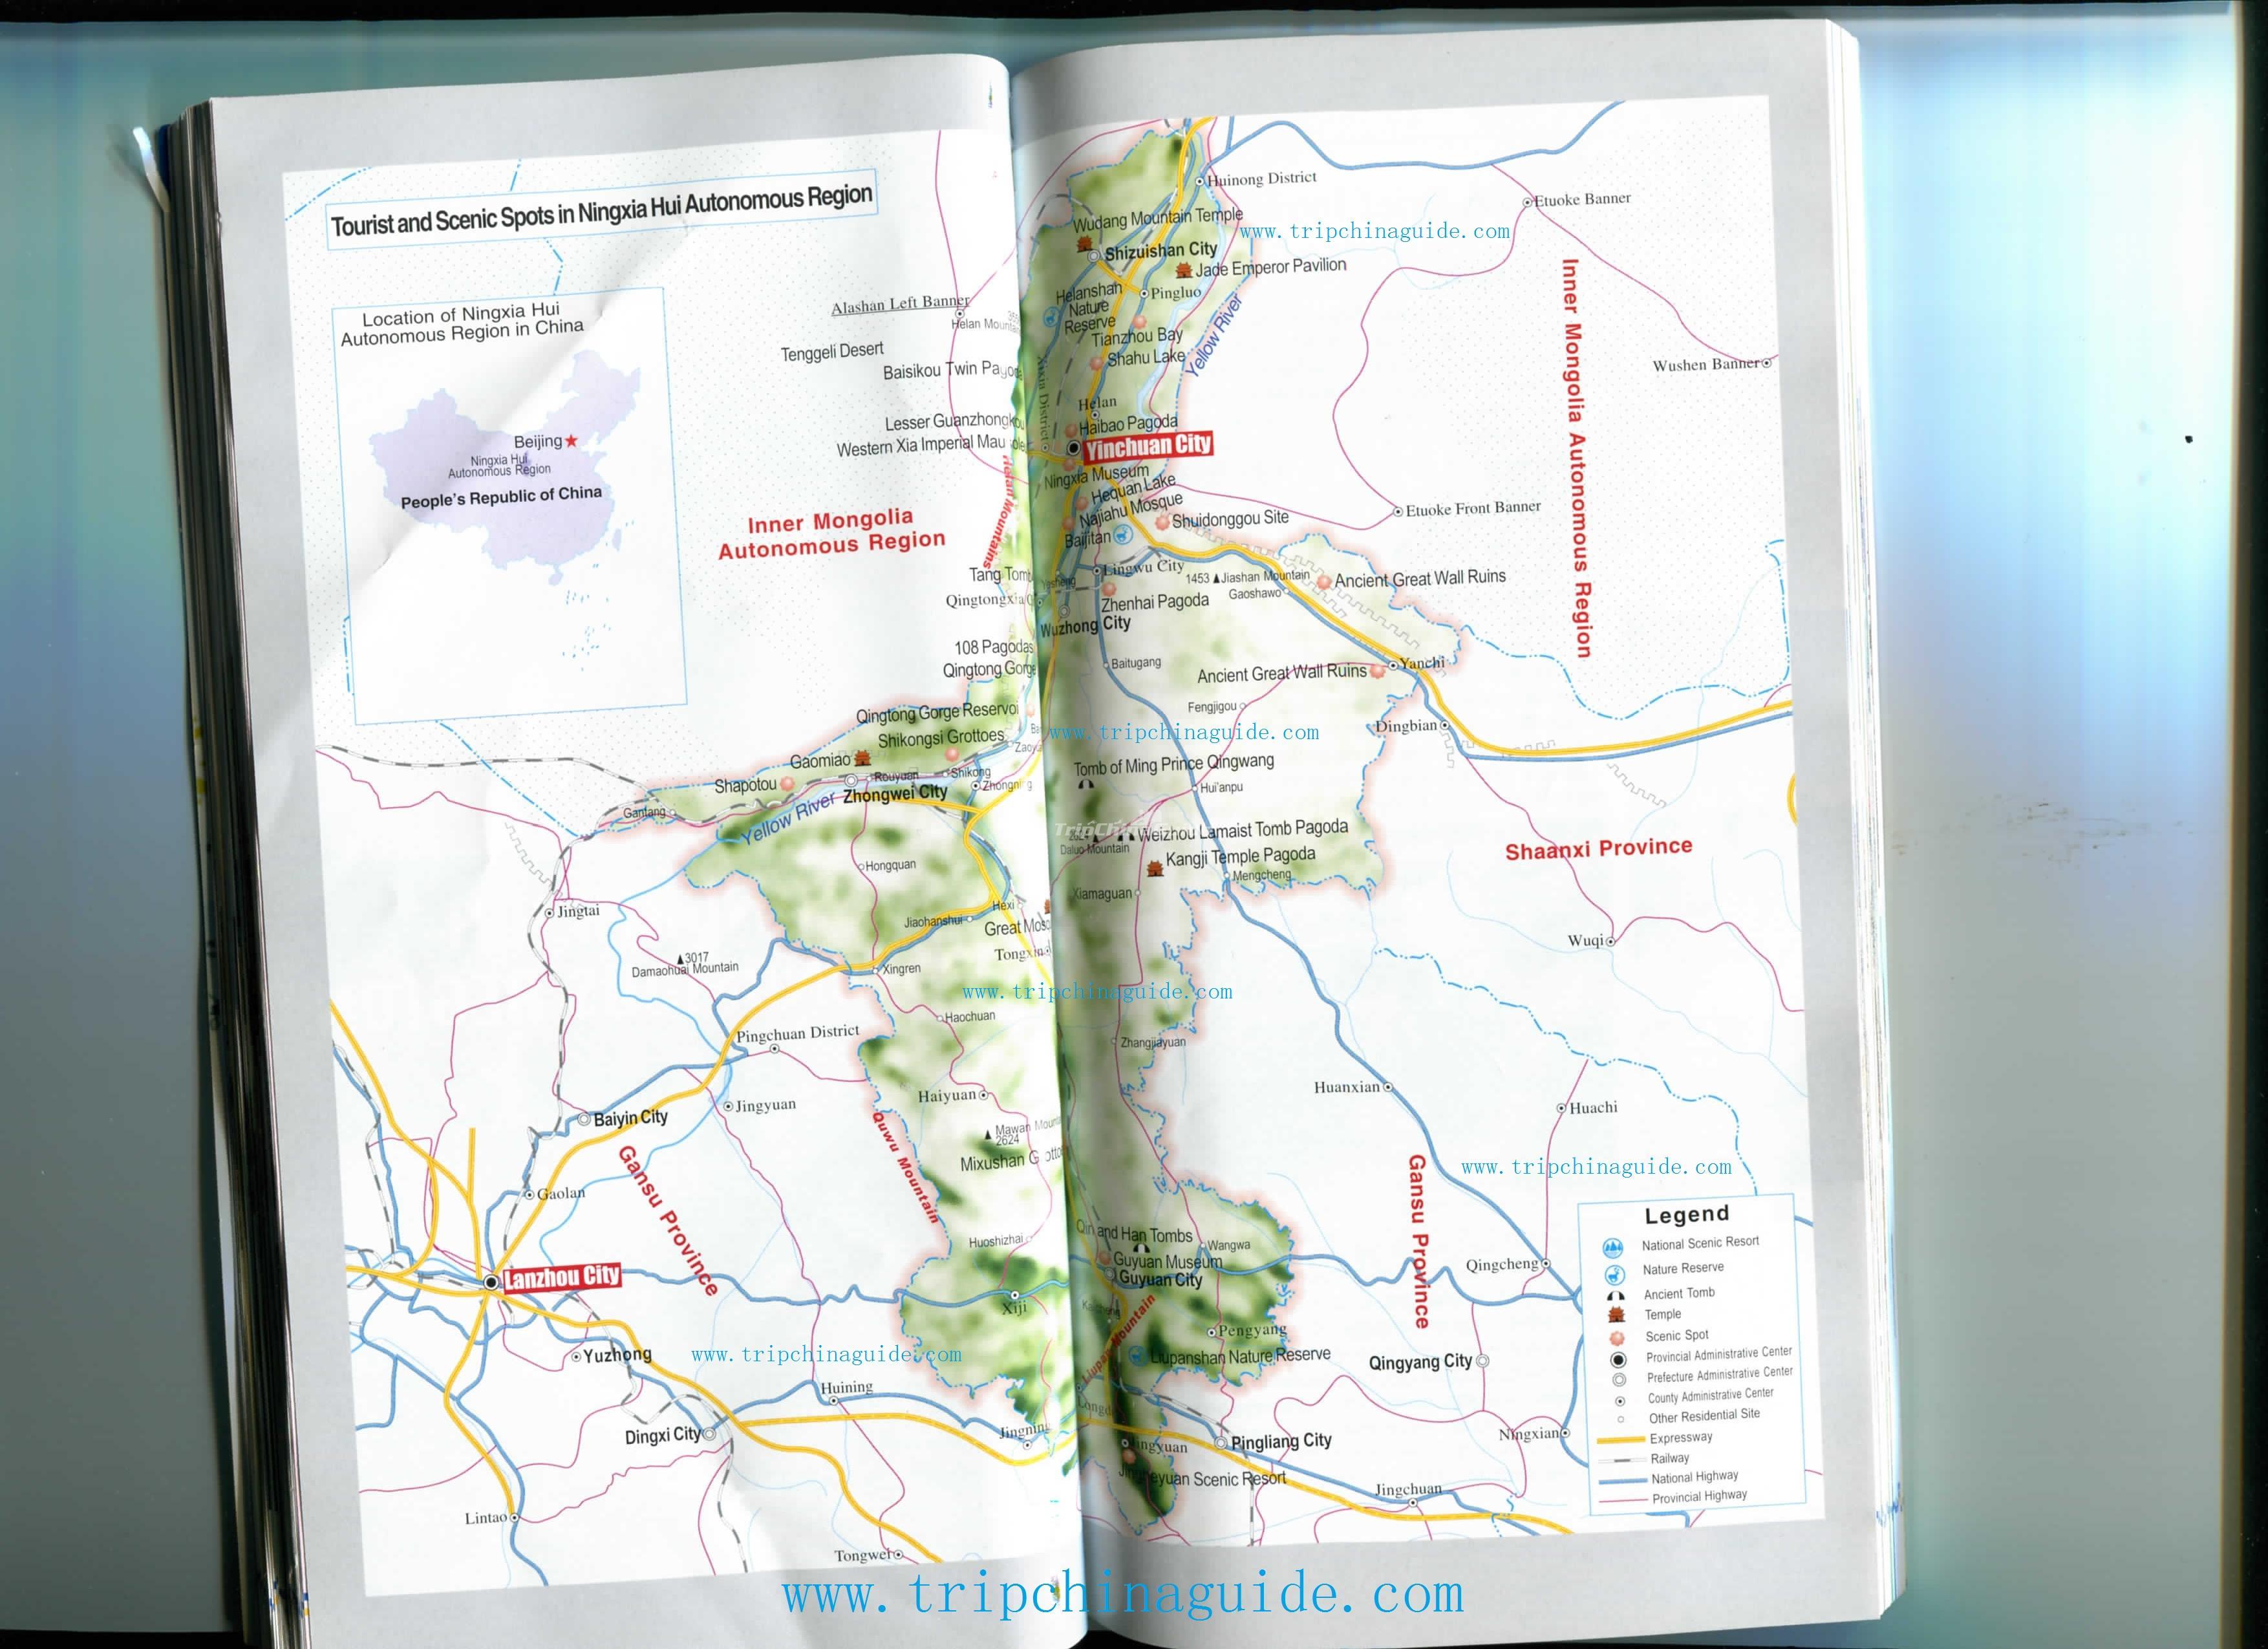 Ningxia China Map.Map Of Scenic Spots In Ningxia Hui Autonomous Region Maps Of Ningxia